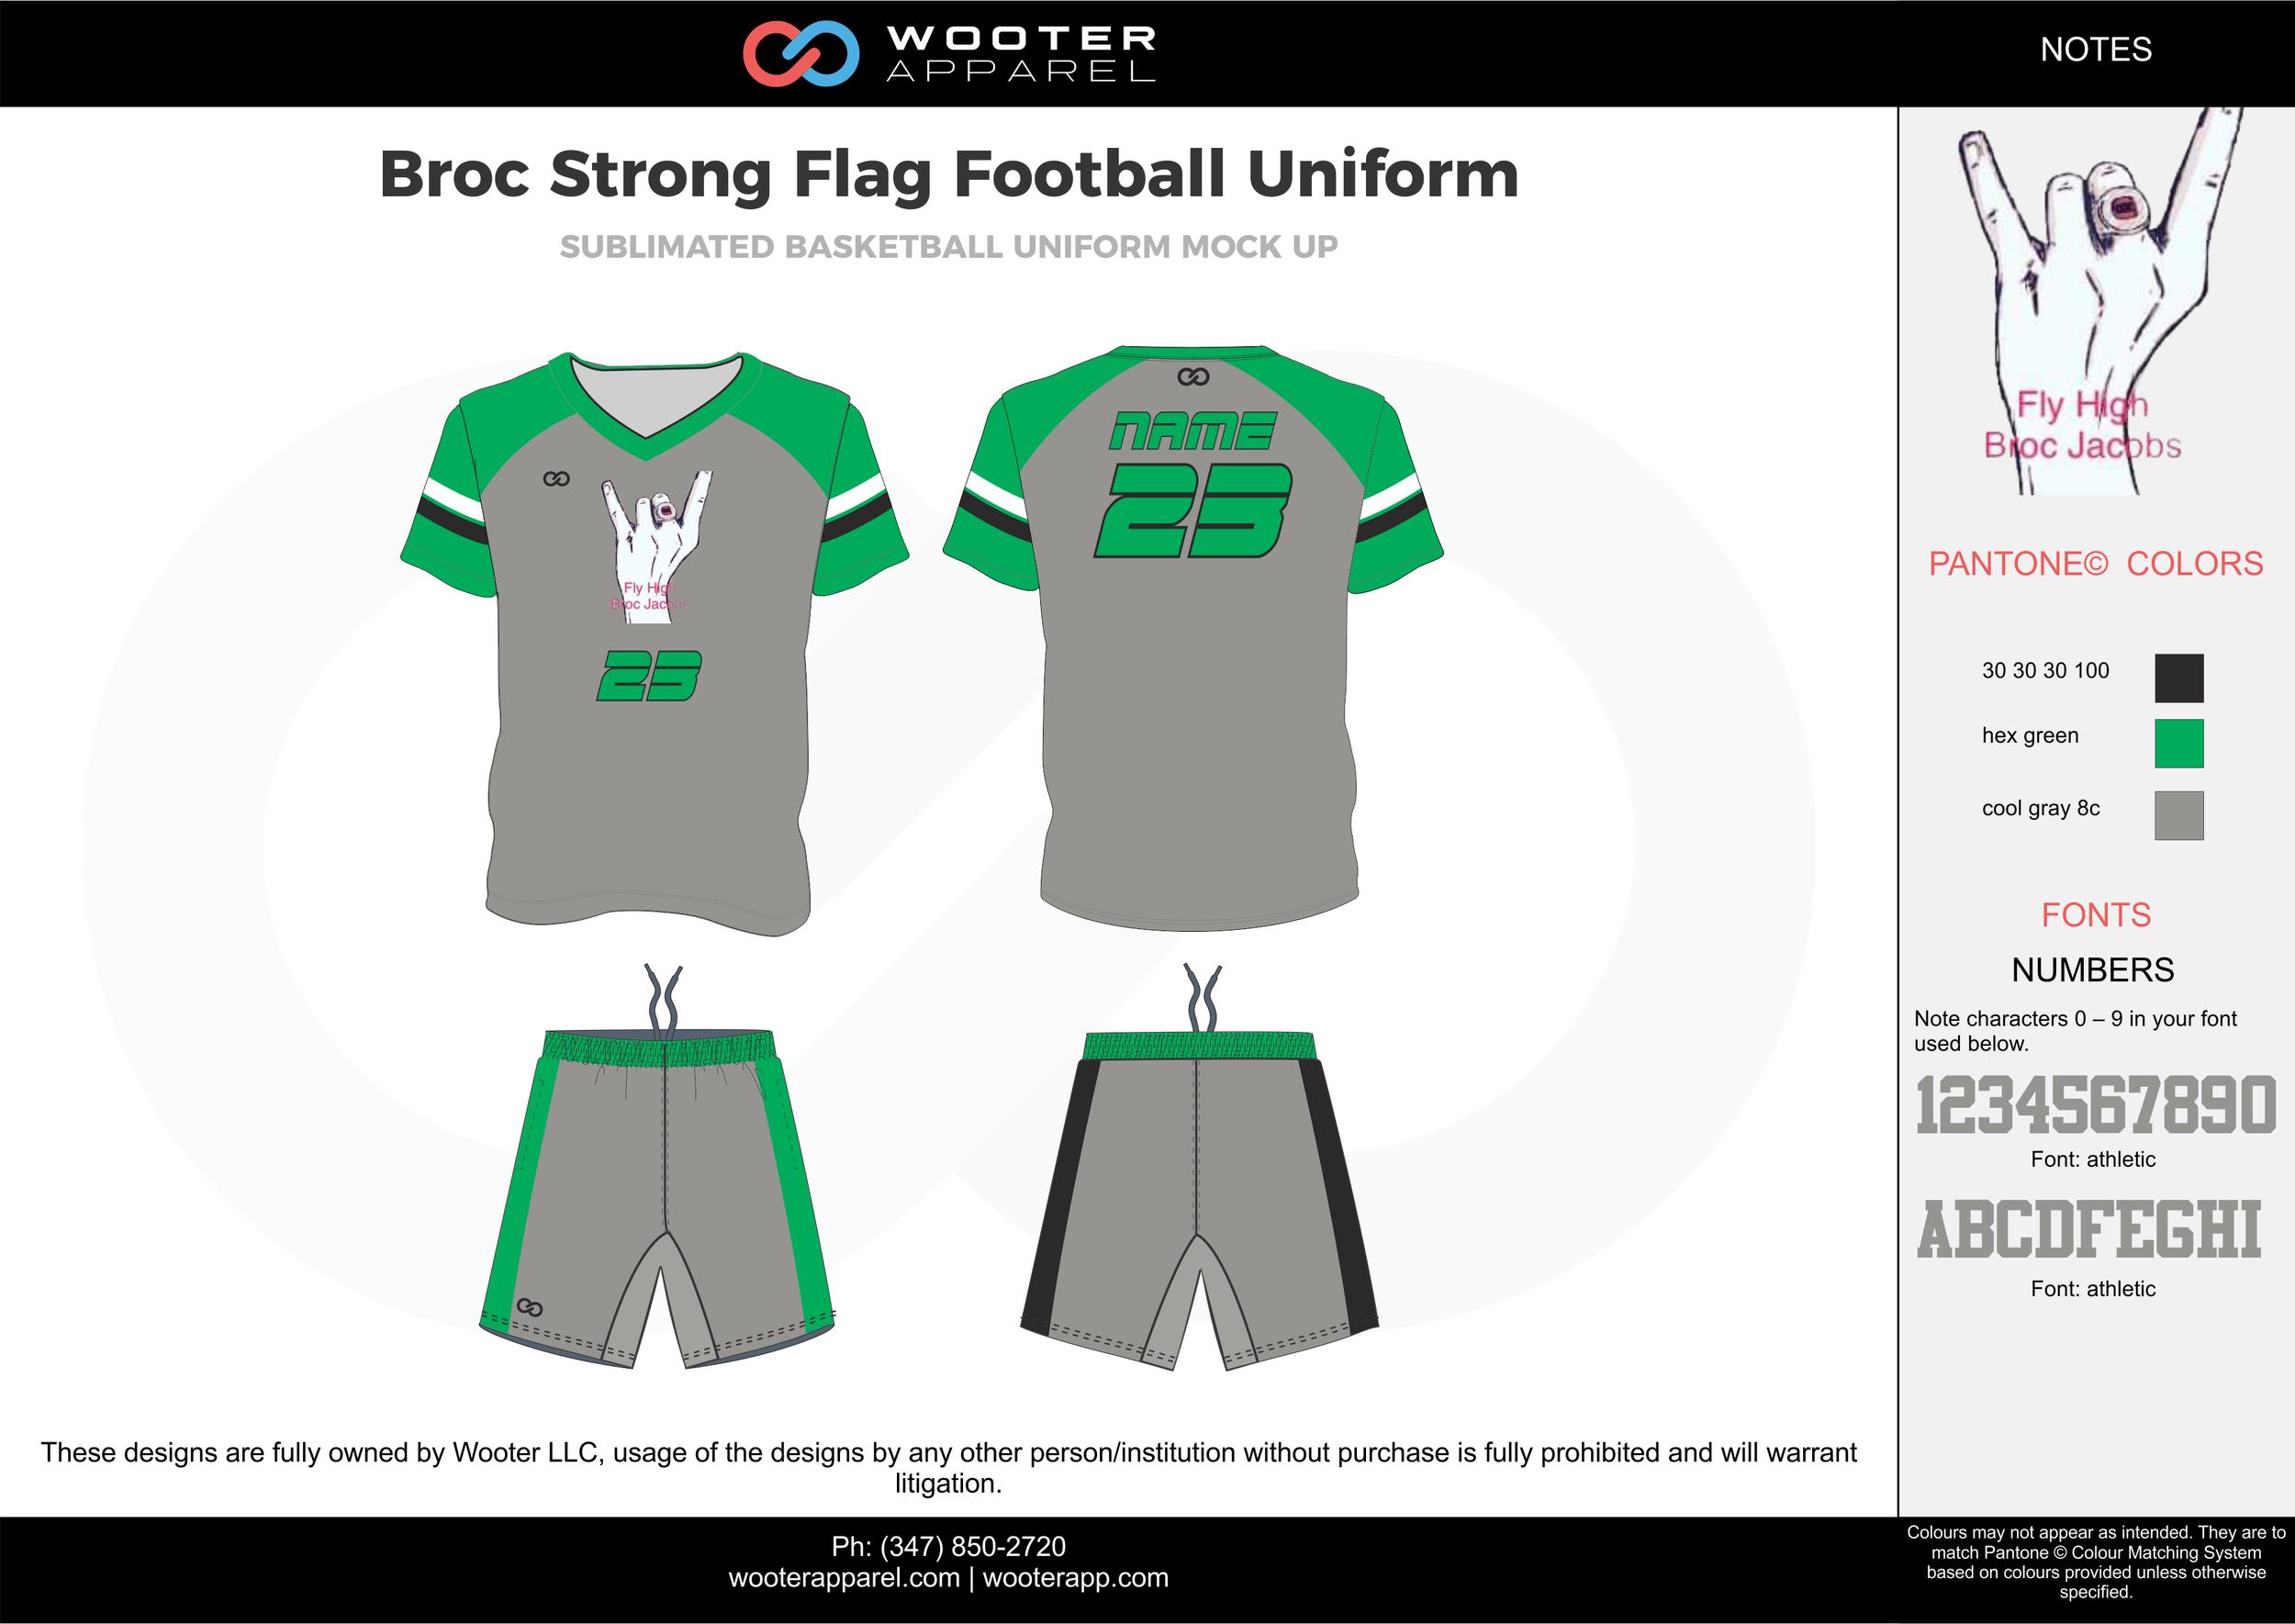 BROC Strong Flag Football Uniform gray green blue flag football uniforms jerseys shorts